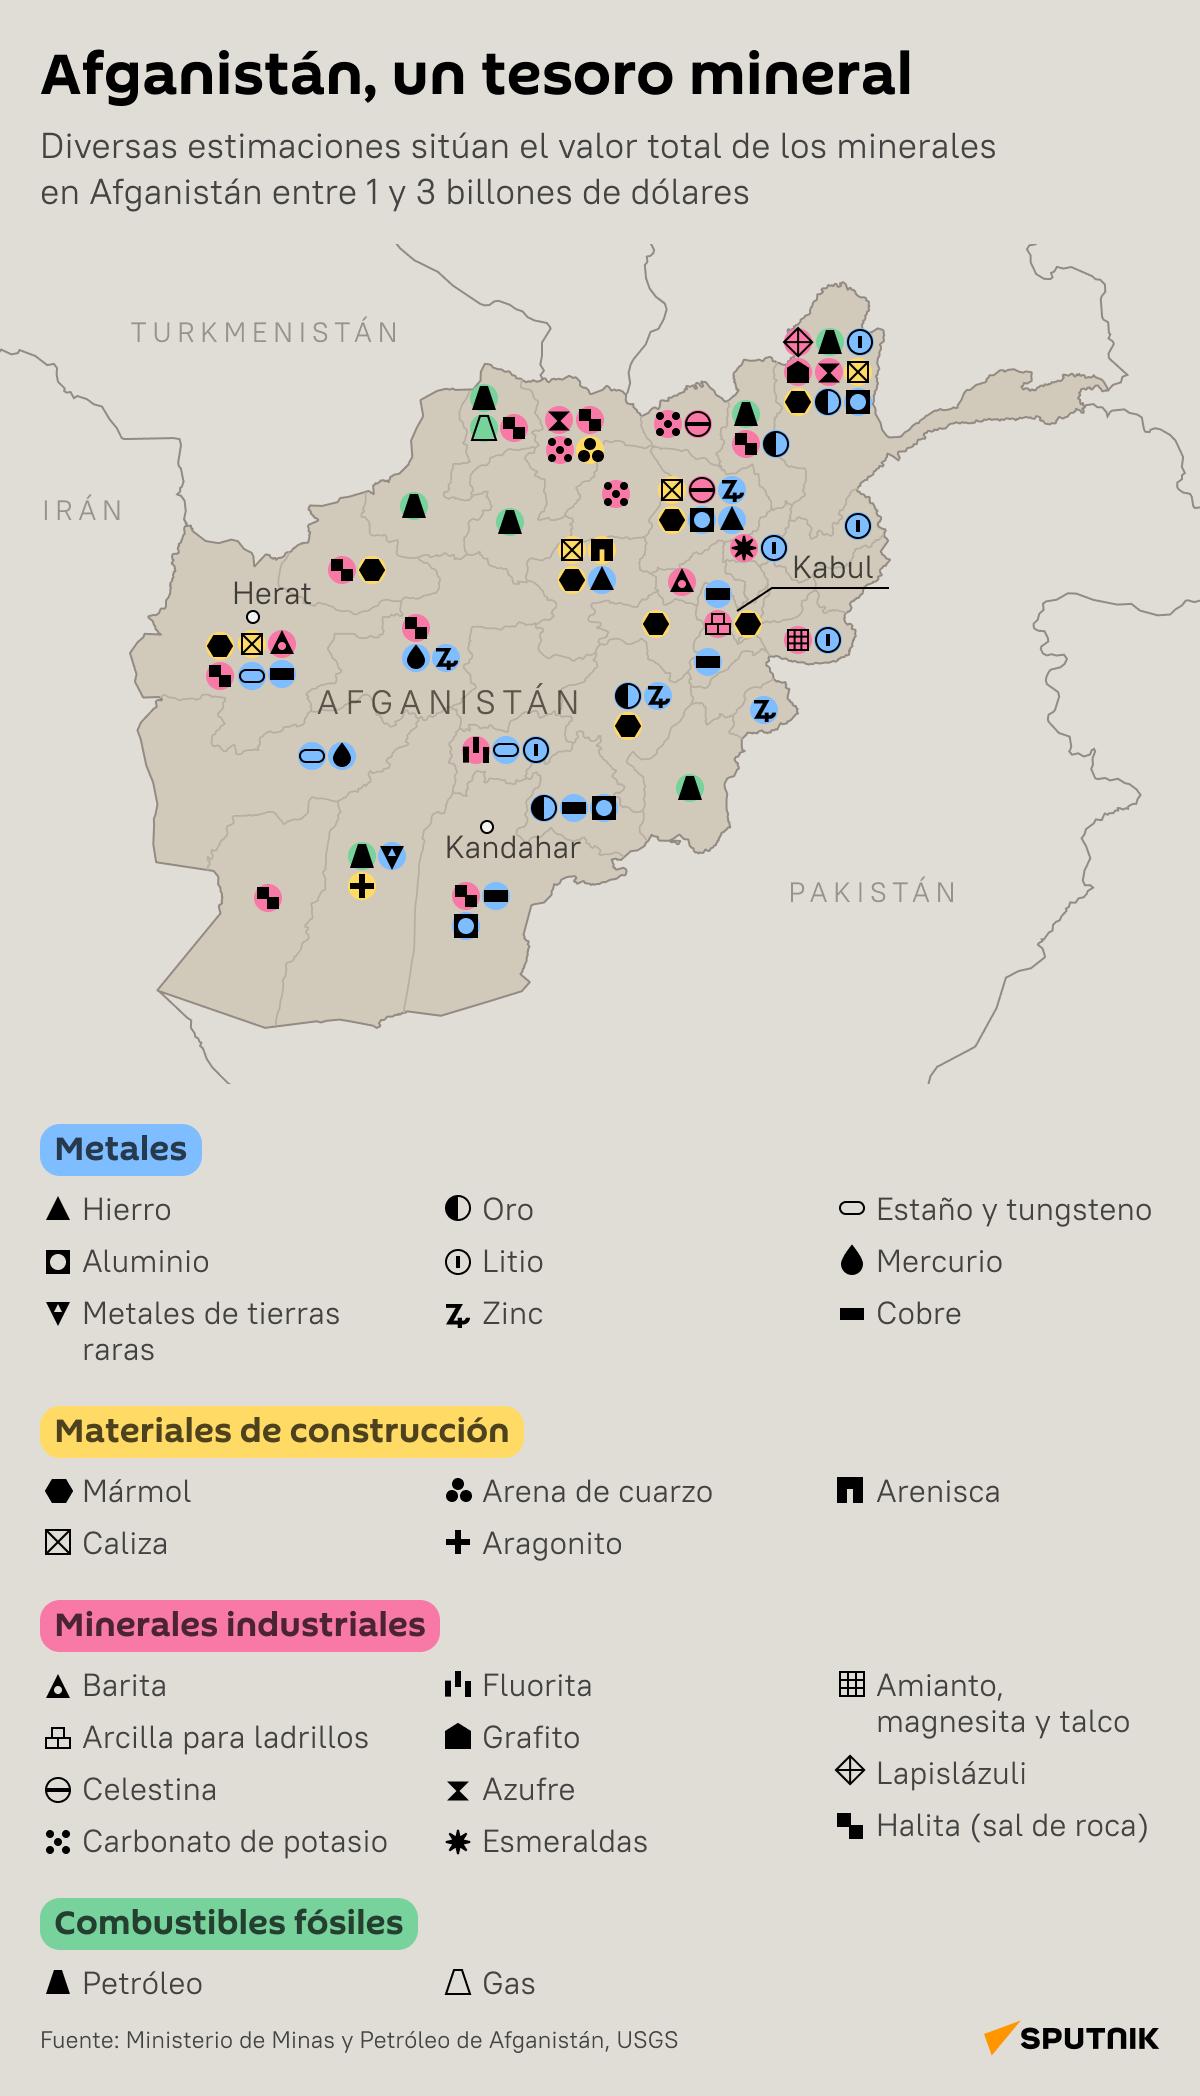 Afganistán, un tesoro mineral - Sputnik Mundo